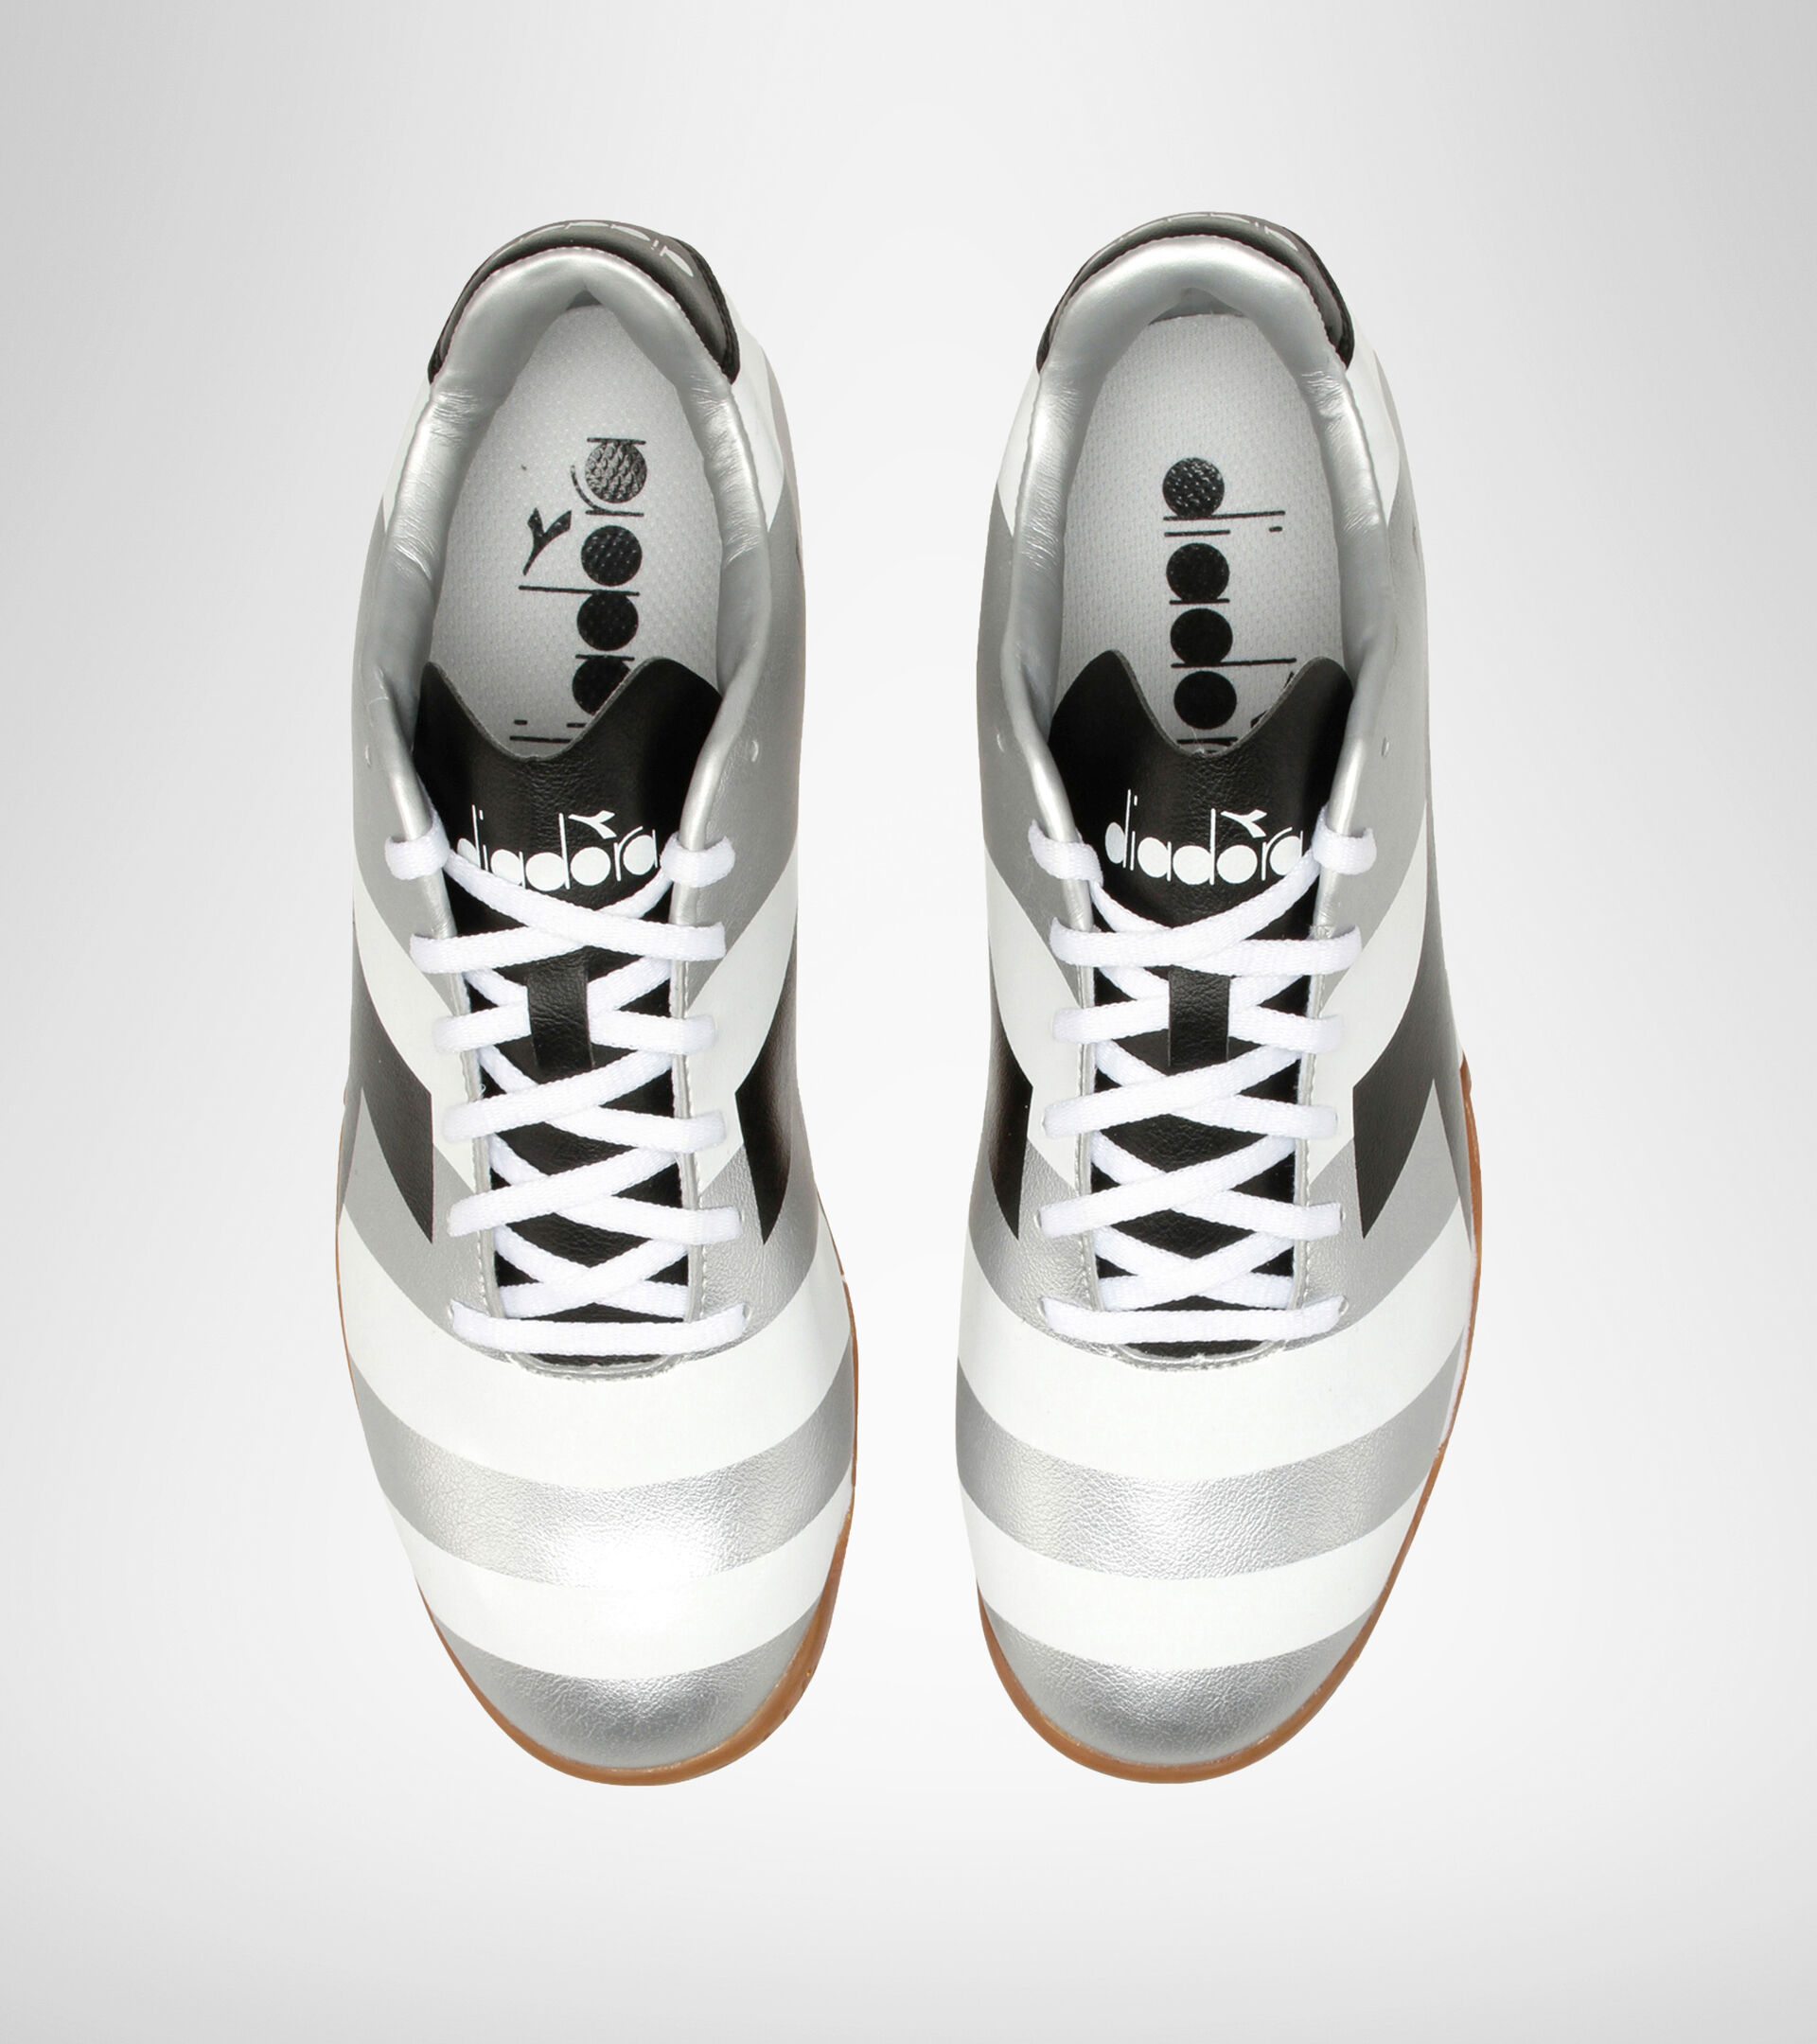 Indoor football boot RAPTOR R ID WHITE/BLACK/SILVER DD - Diadora